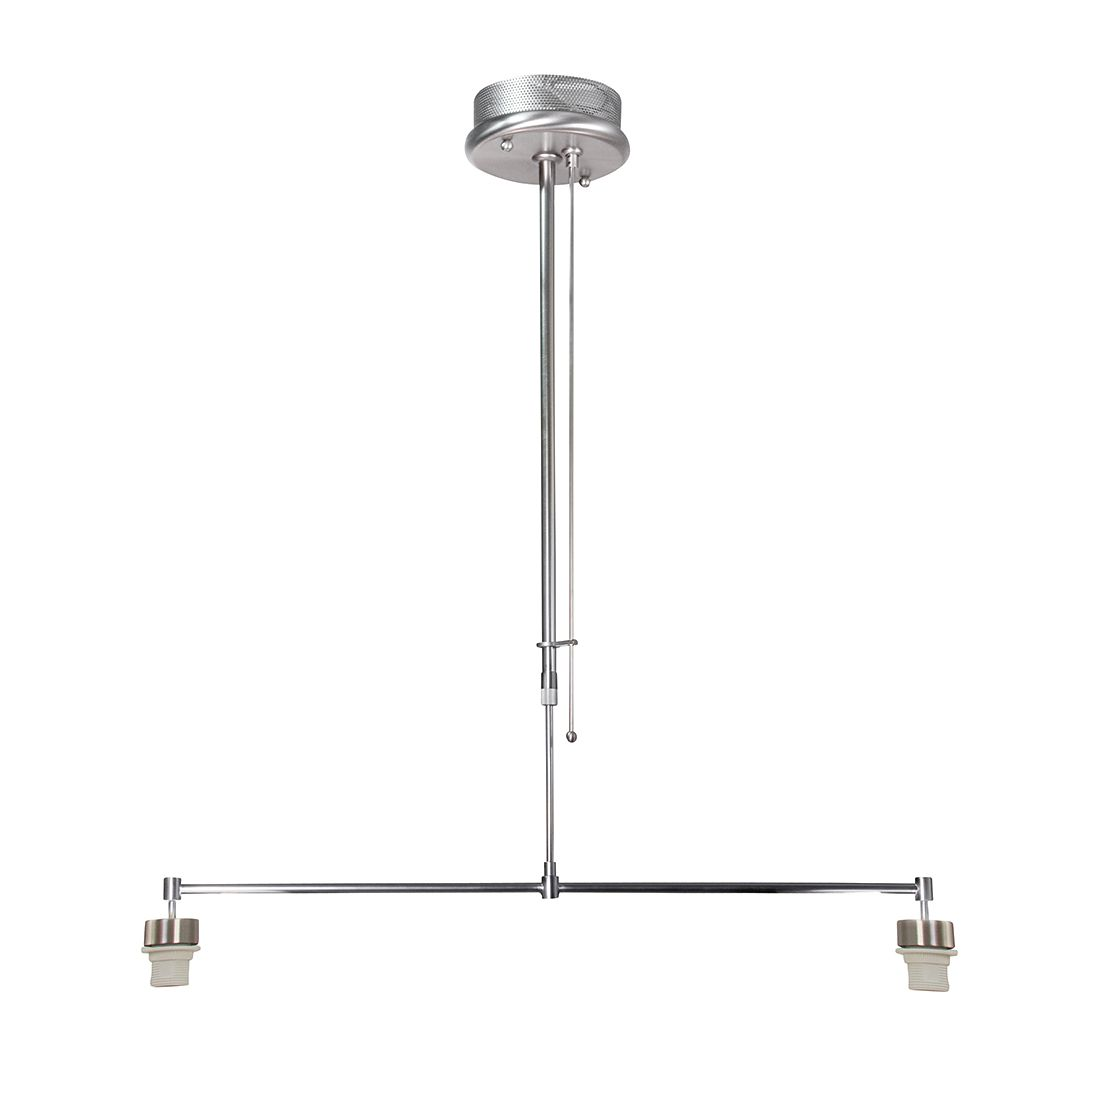 EEK A++, Suspension avec armatures Gramineus - 2 ampoules Nickel mat, Steinhauer